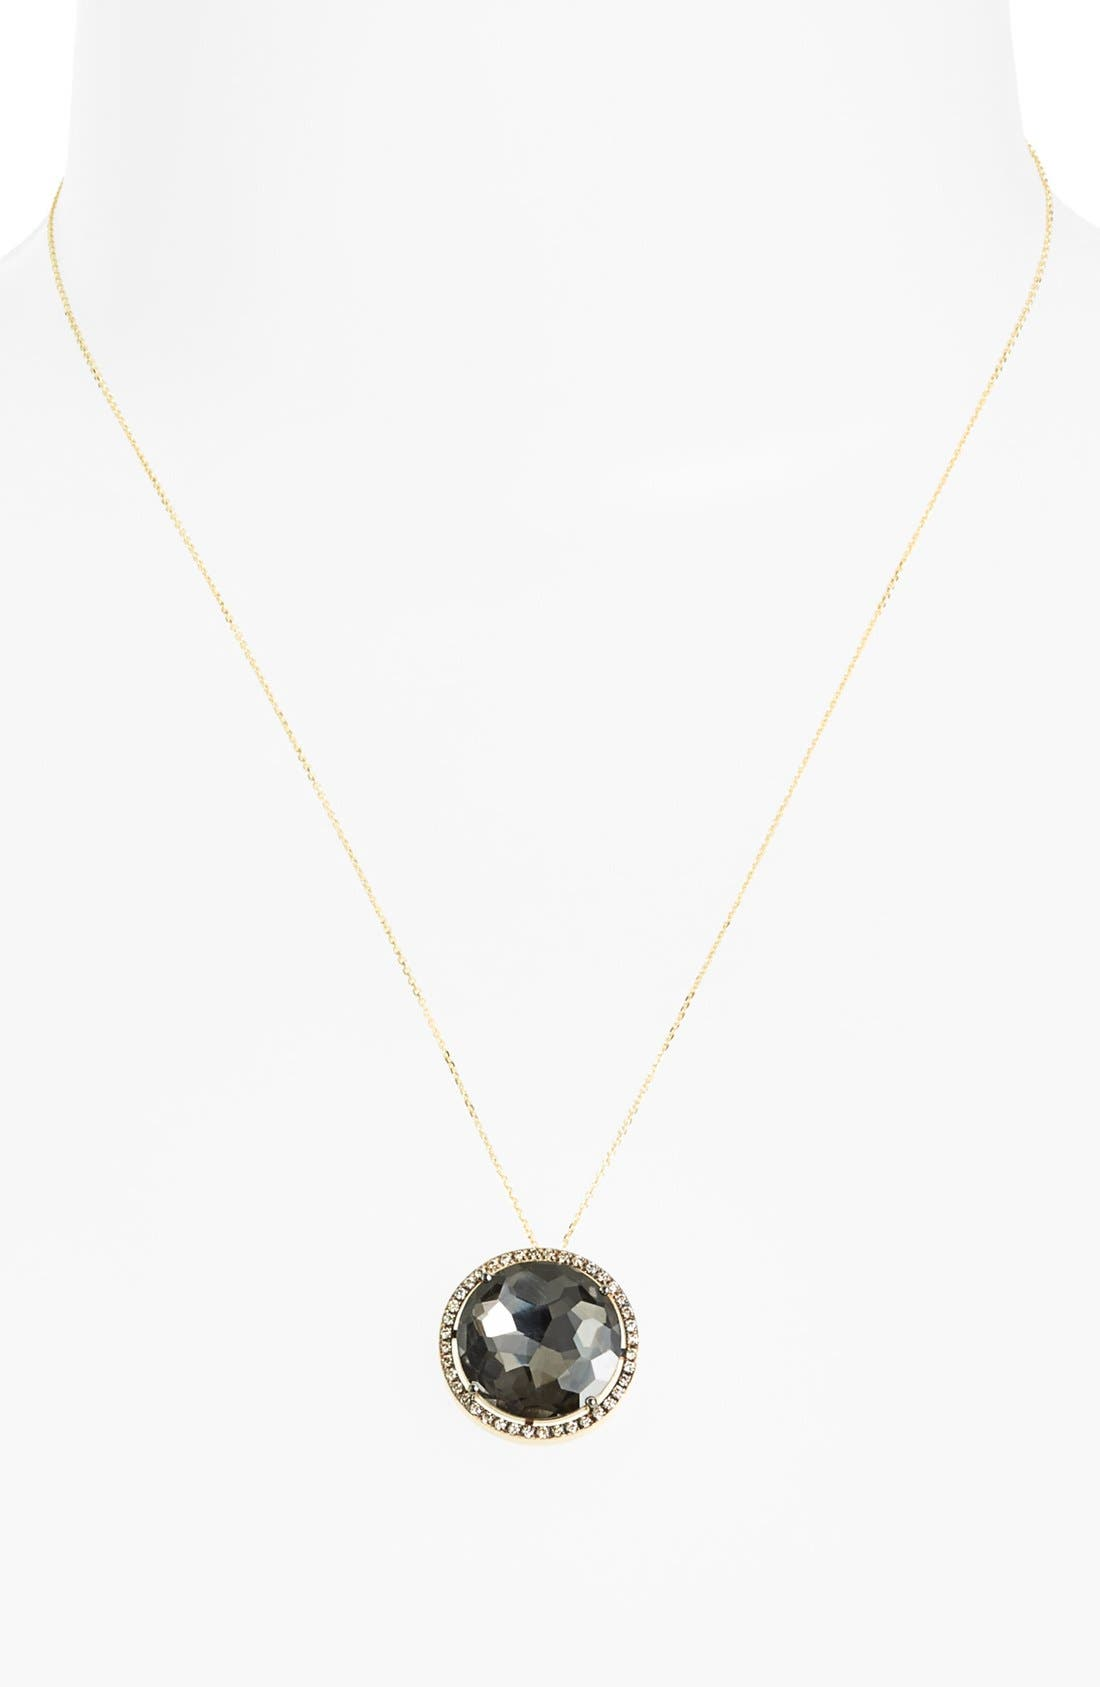 KALAN by Suzanne Kalan Diamond & Stone Pendant Necklace,                             Alternate thumbnail 2, color,                             YELLOW GOLD/ BLACK QUARTZ